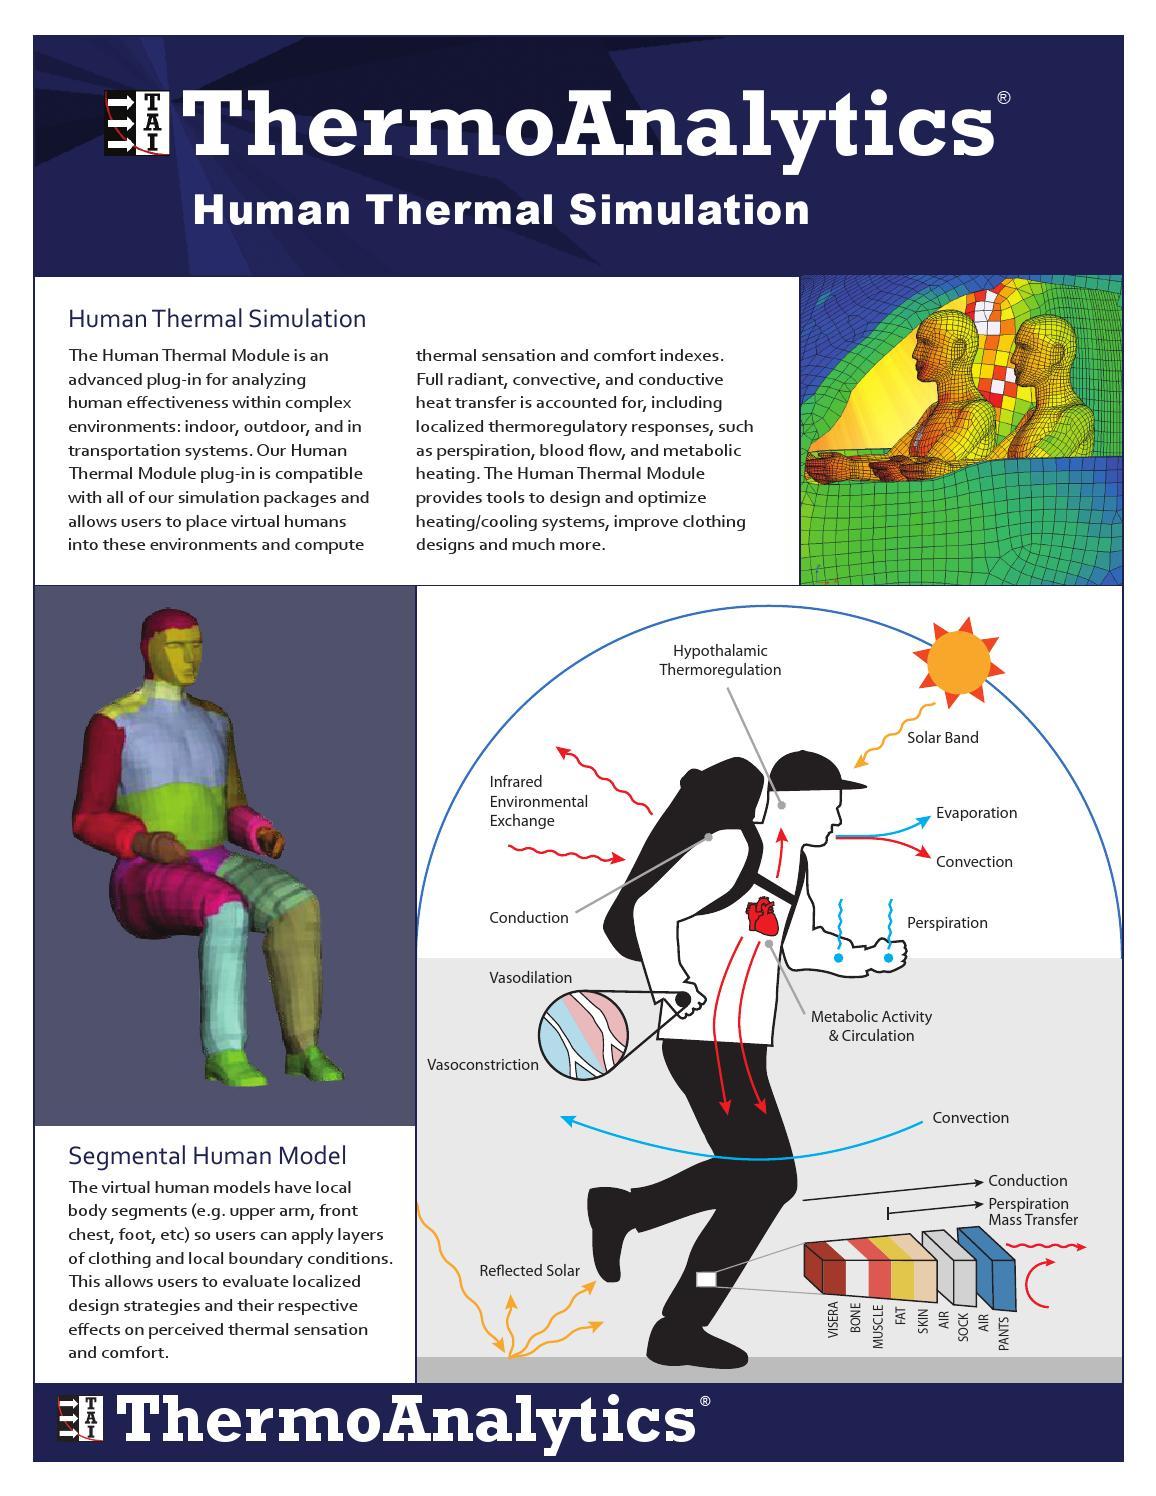 Human Thermal Simulation by ThermoAnalytics - issuu